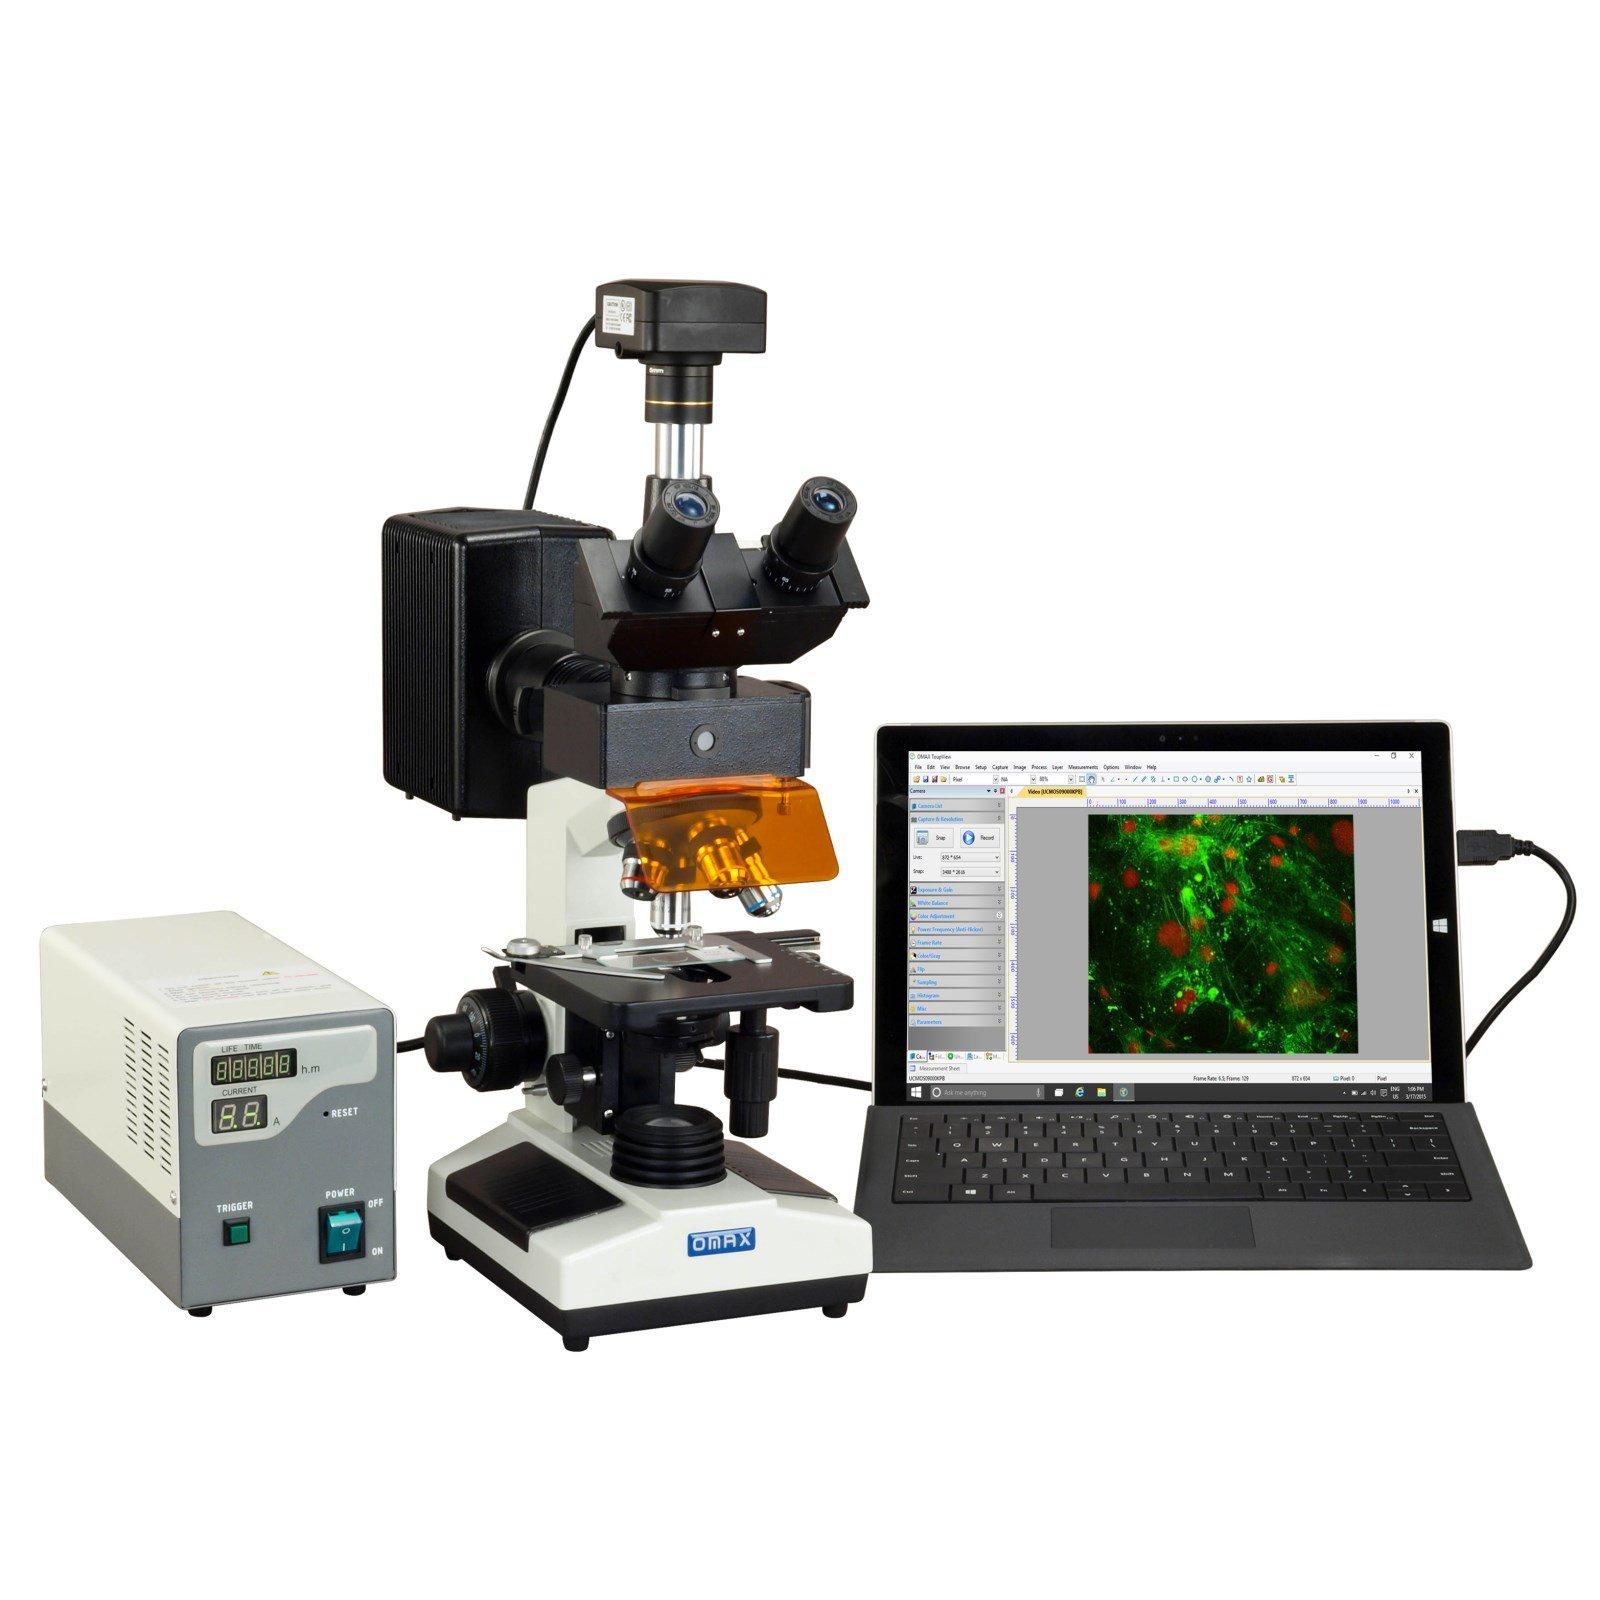 OMAX 40X-2500X 18MP USB 3.0 Digital EPI-Fluorescence Trinocular Compound Biological Lab Microscope by OMAX